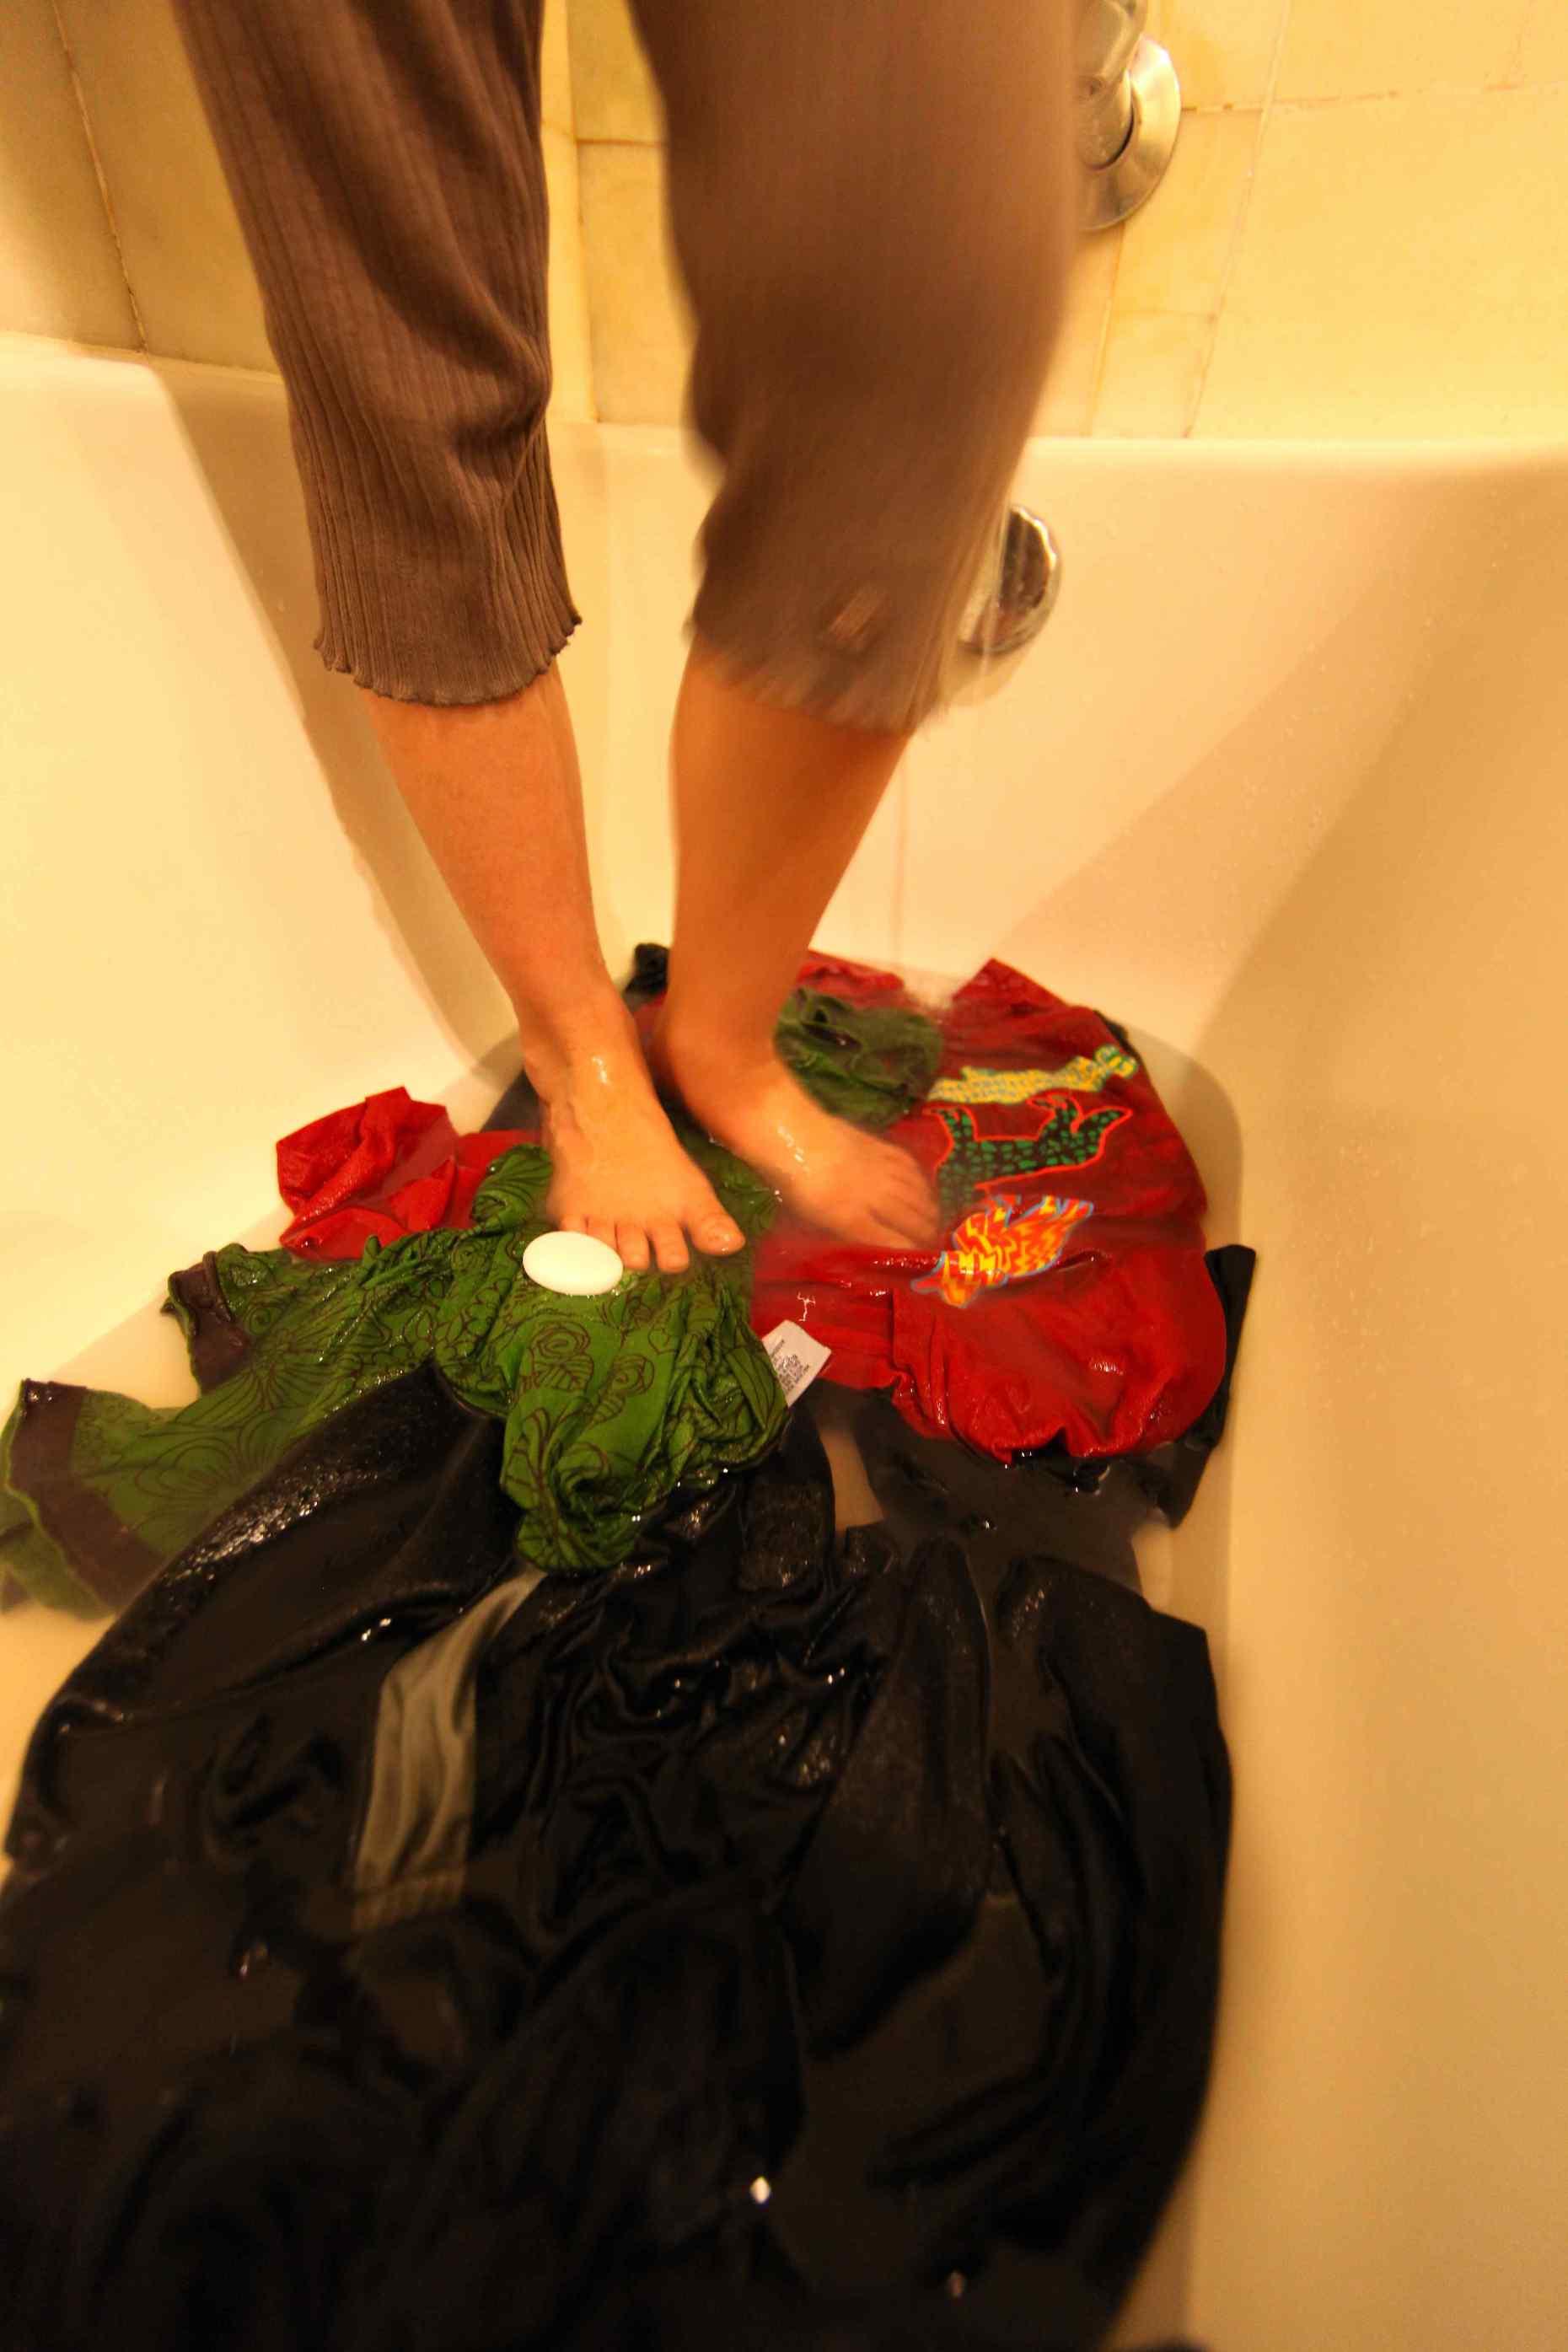 Bathtub Laundry!